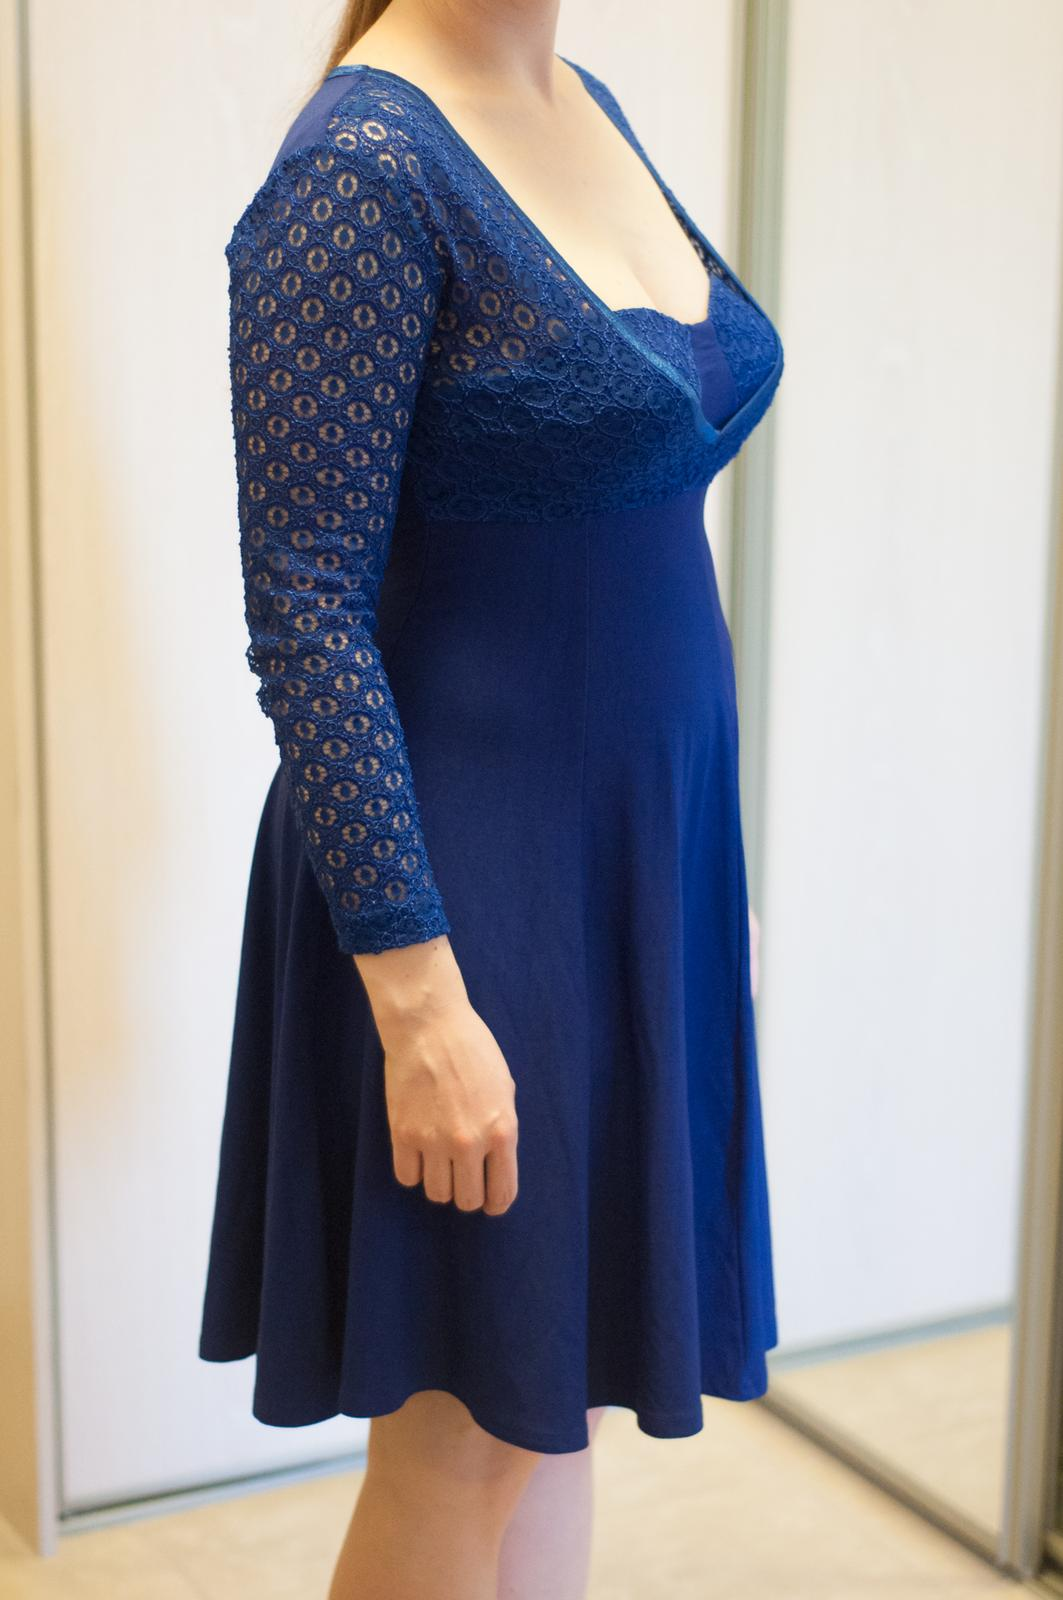 Tmavomodré elastické šaty s čipkou - Obrázok č. 2